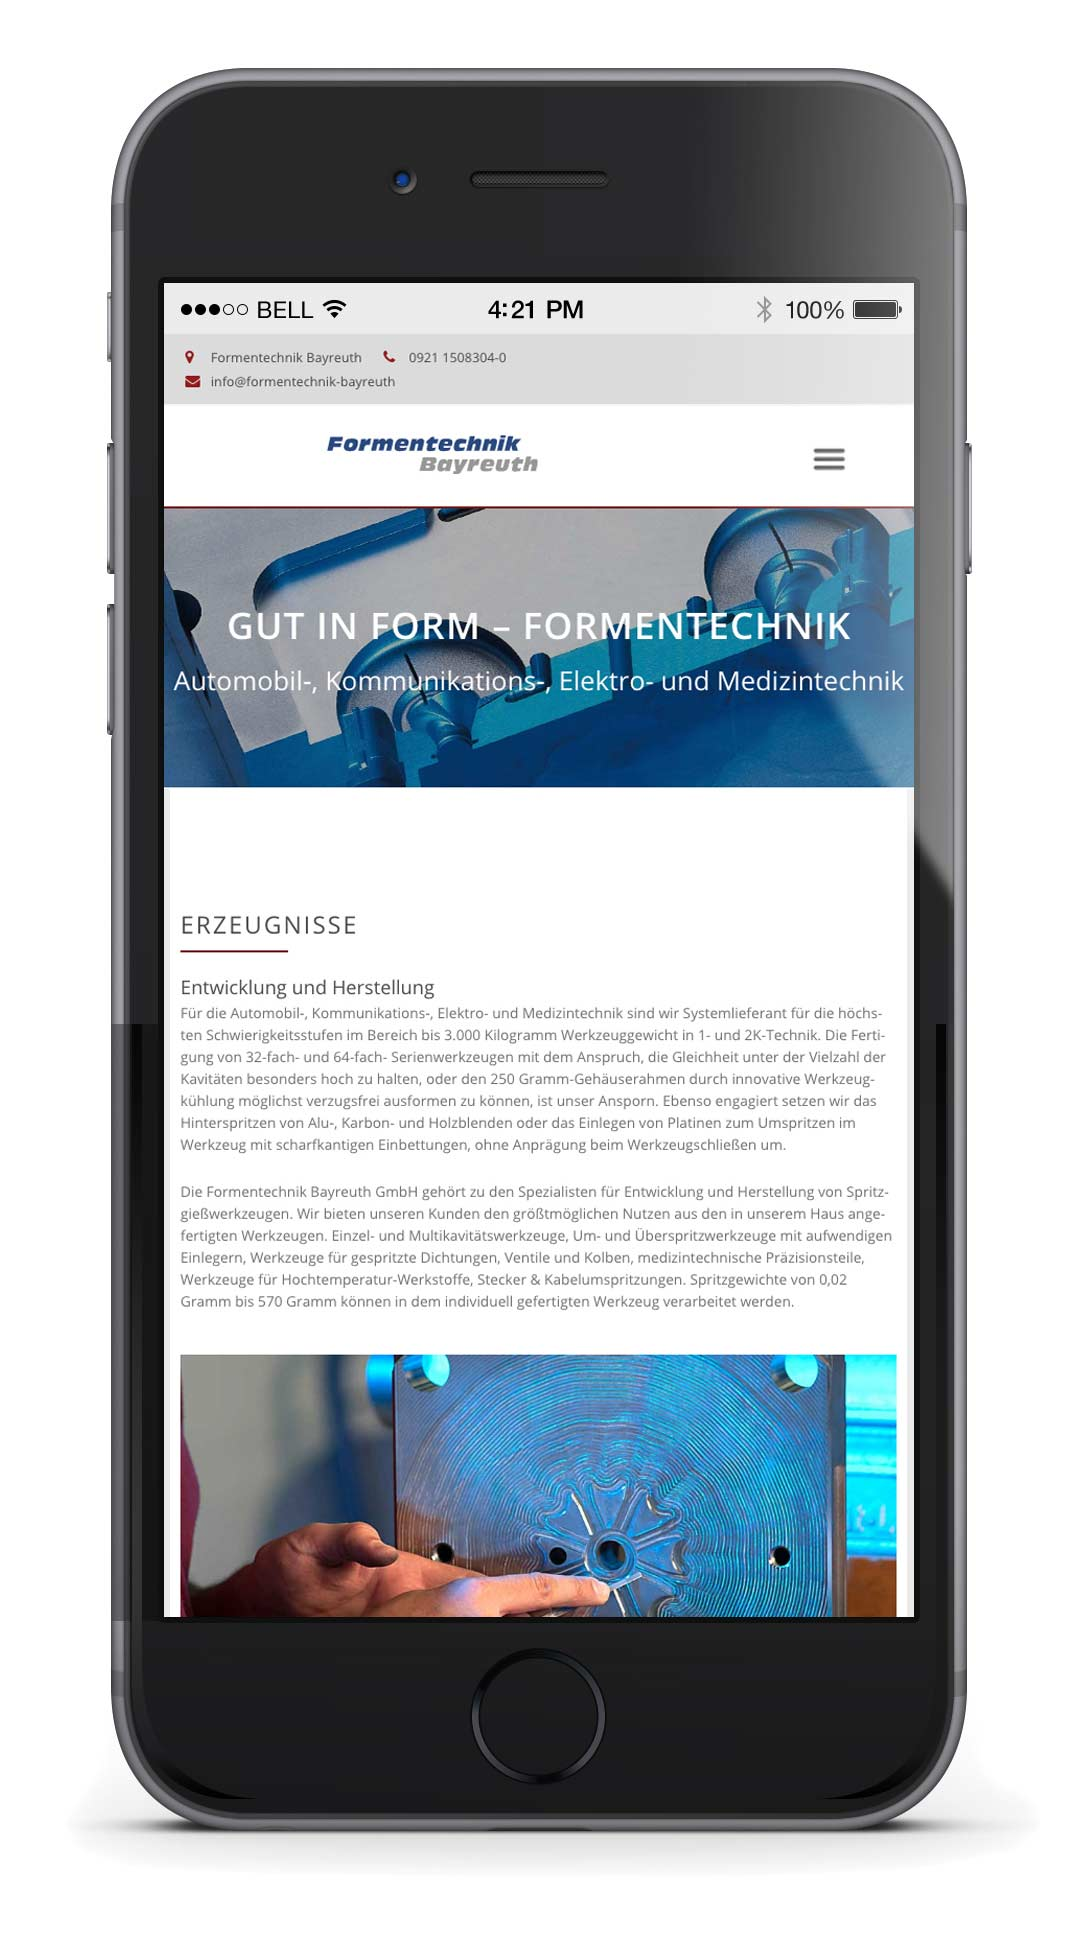 formentechnik-bayreuth-de-erzeugnisse-titel-mobil